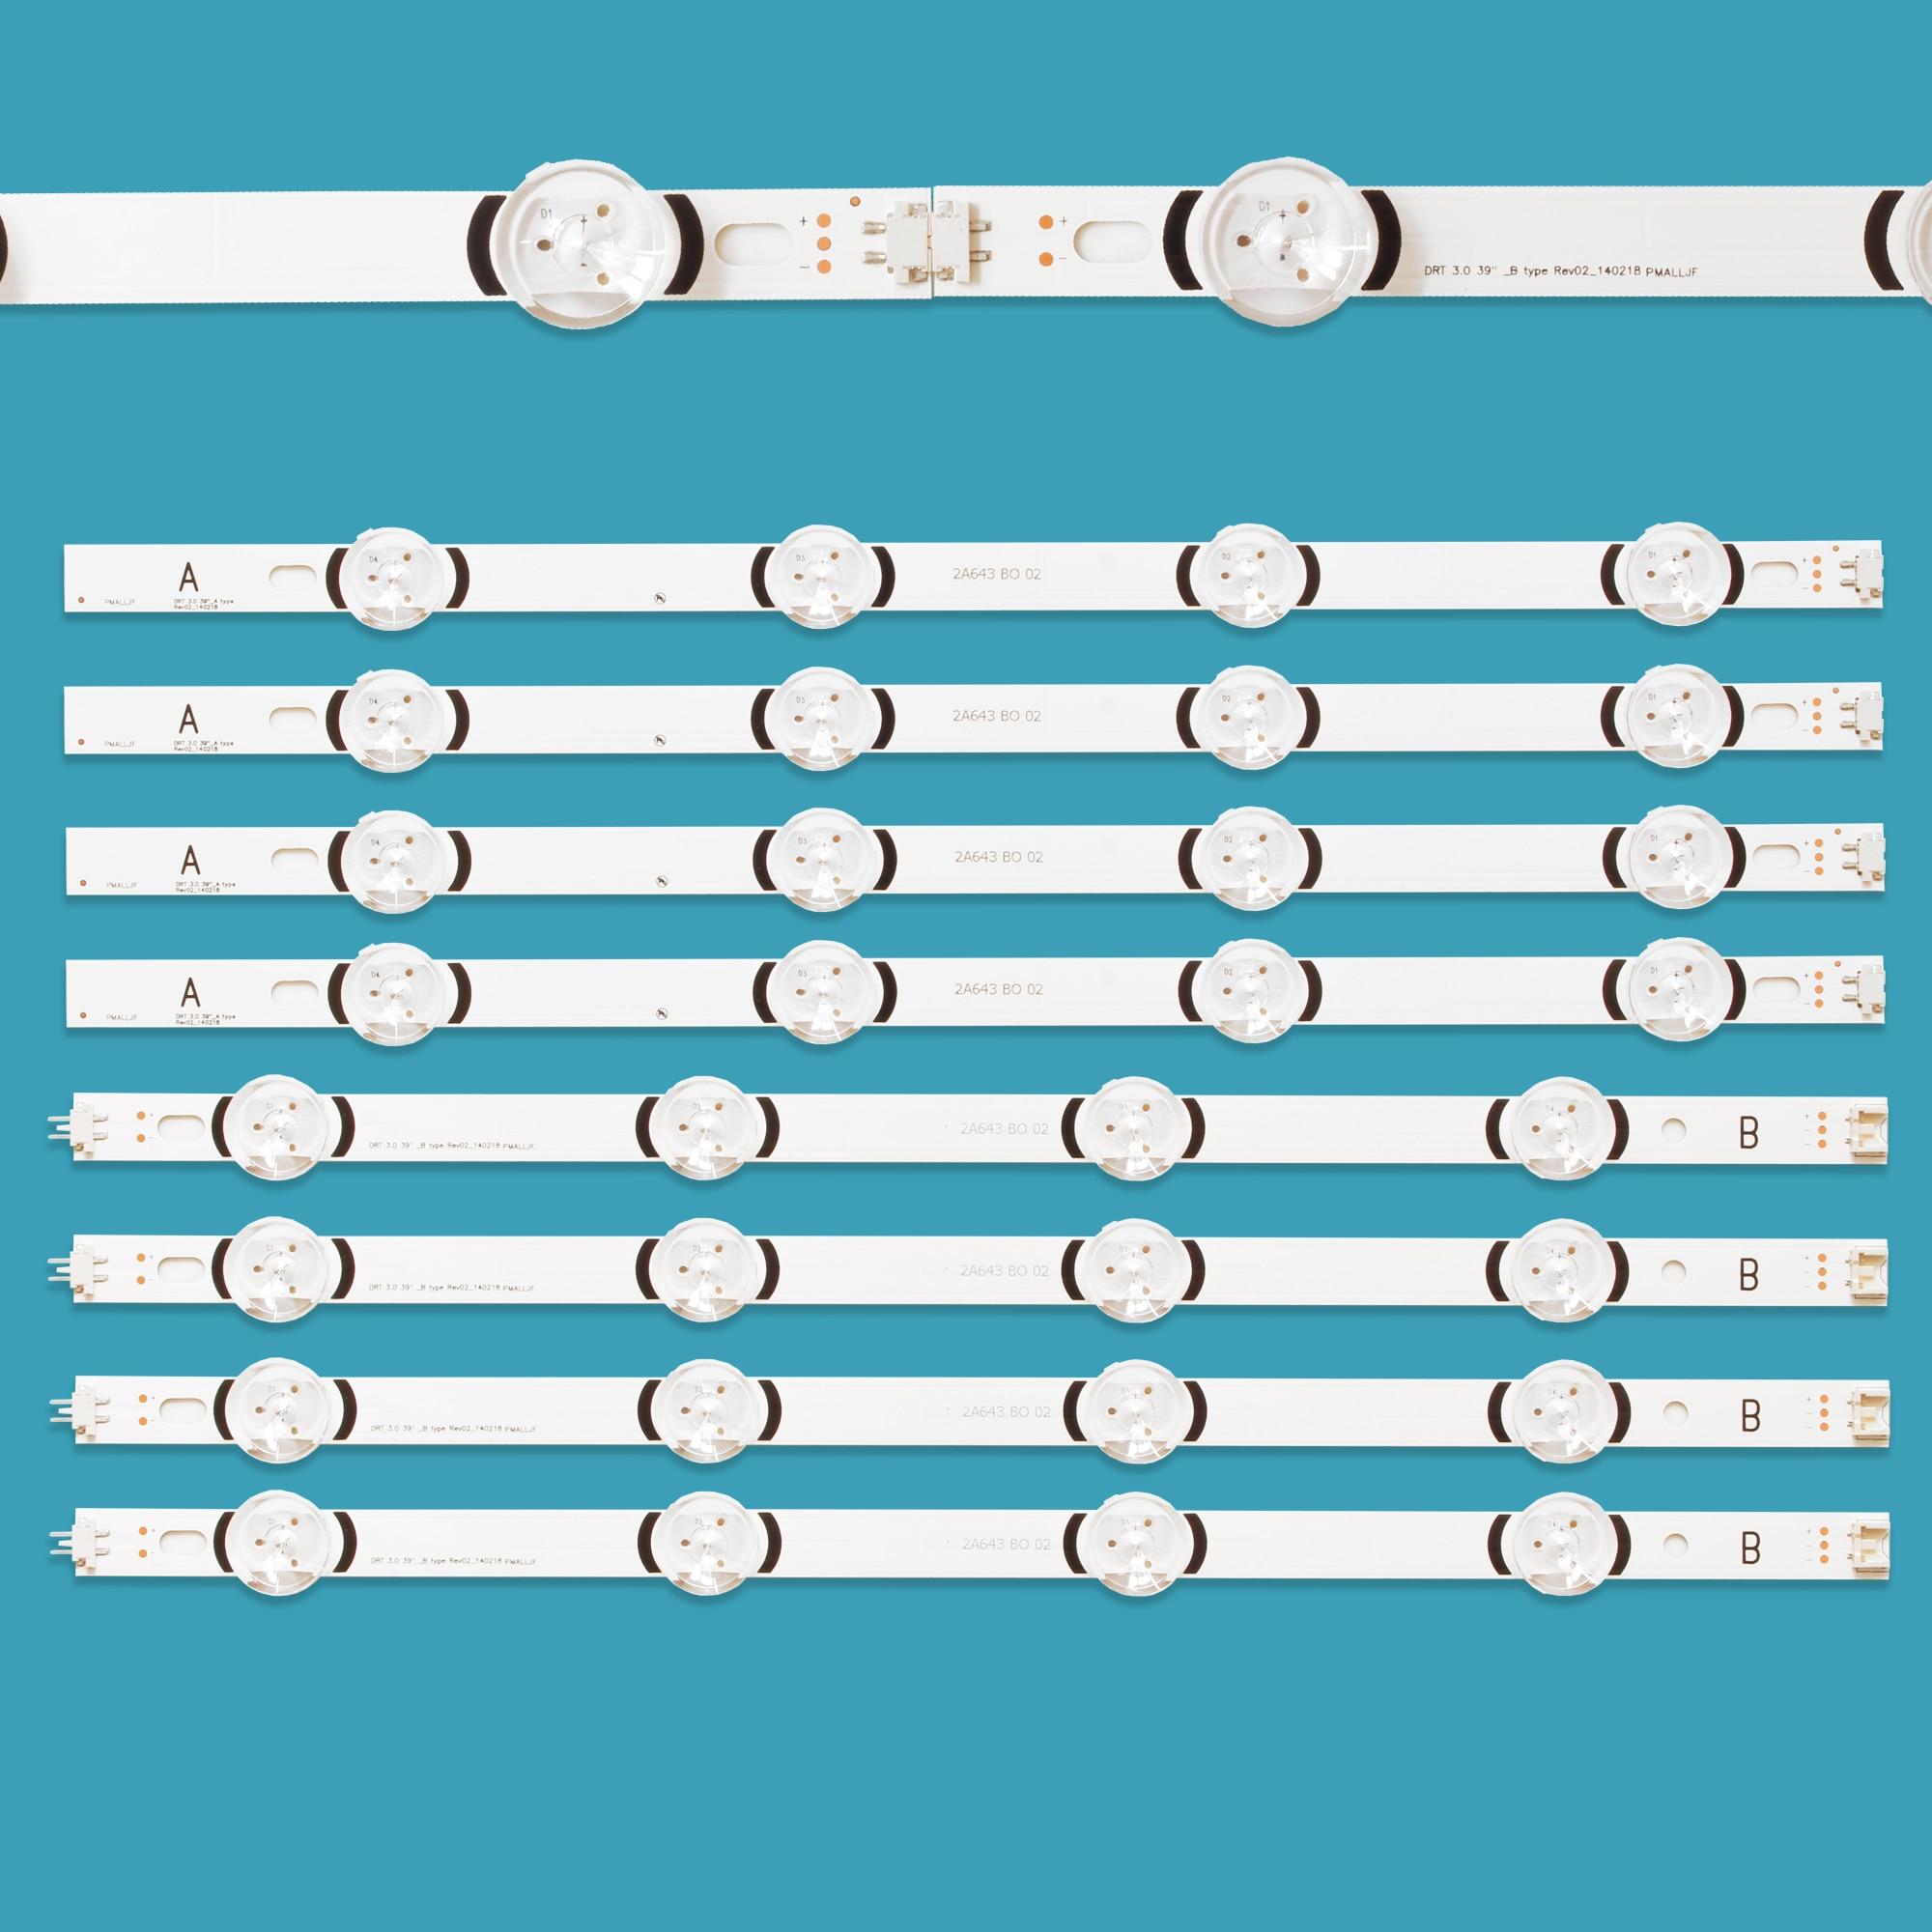 New 10, You Replace Led Tape For LG TV 49lf5500 Innotek DRT 3.0 49